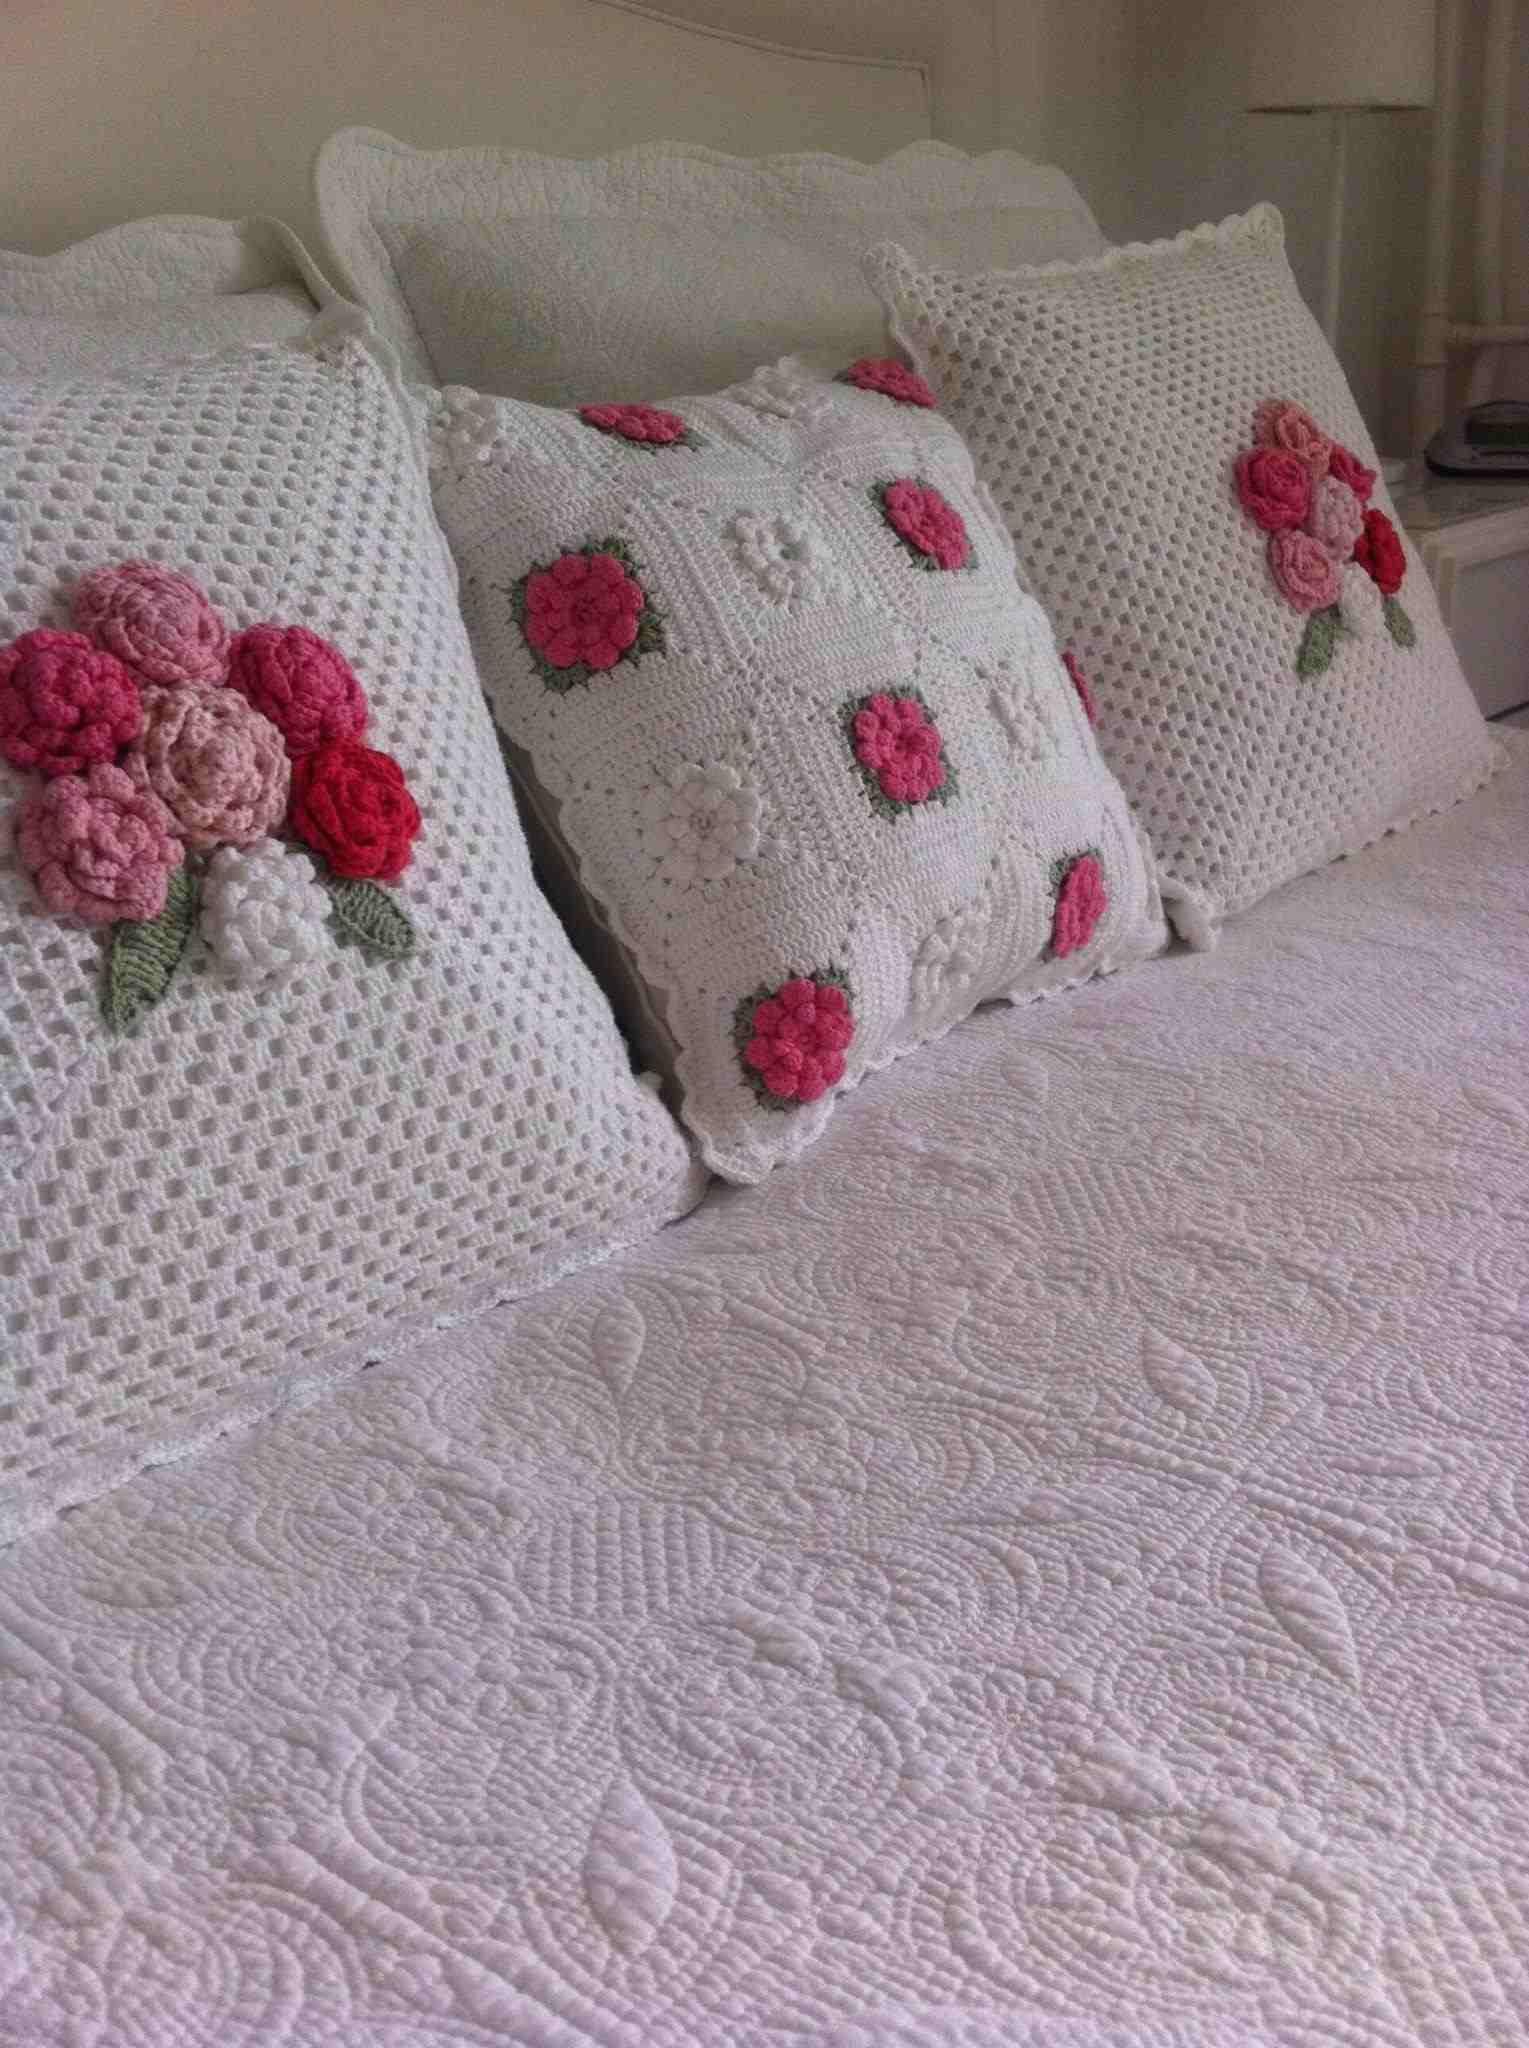 Crochet Pillow Cover Pinterest crochet cushion covers in